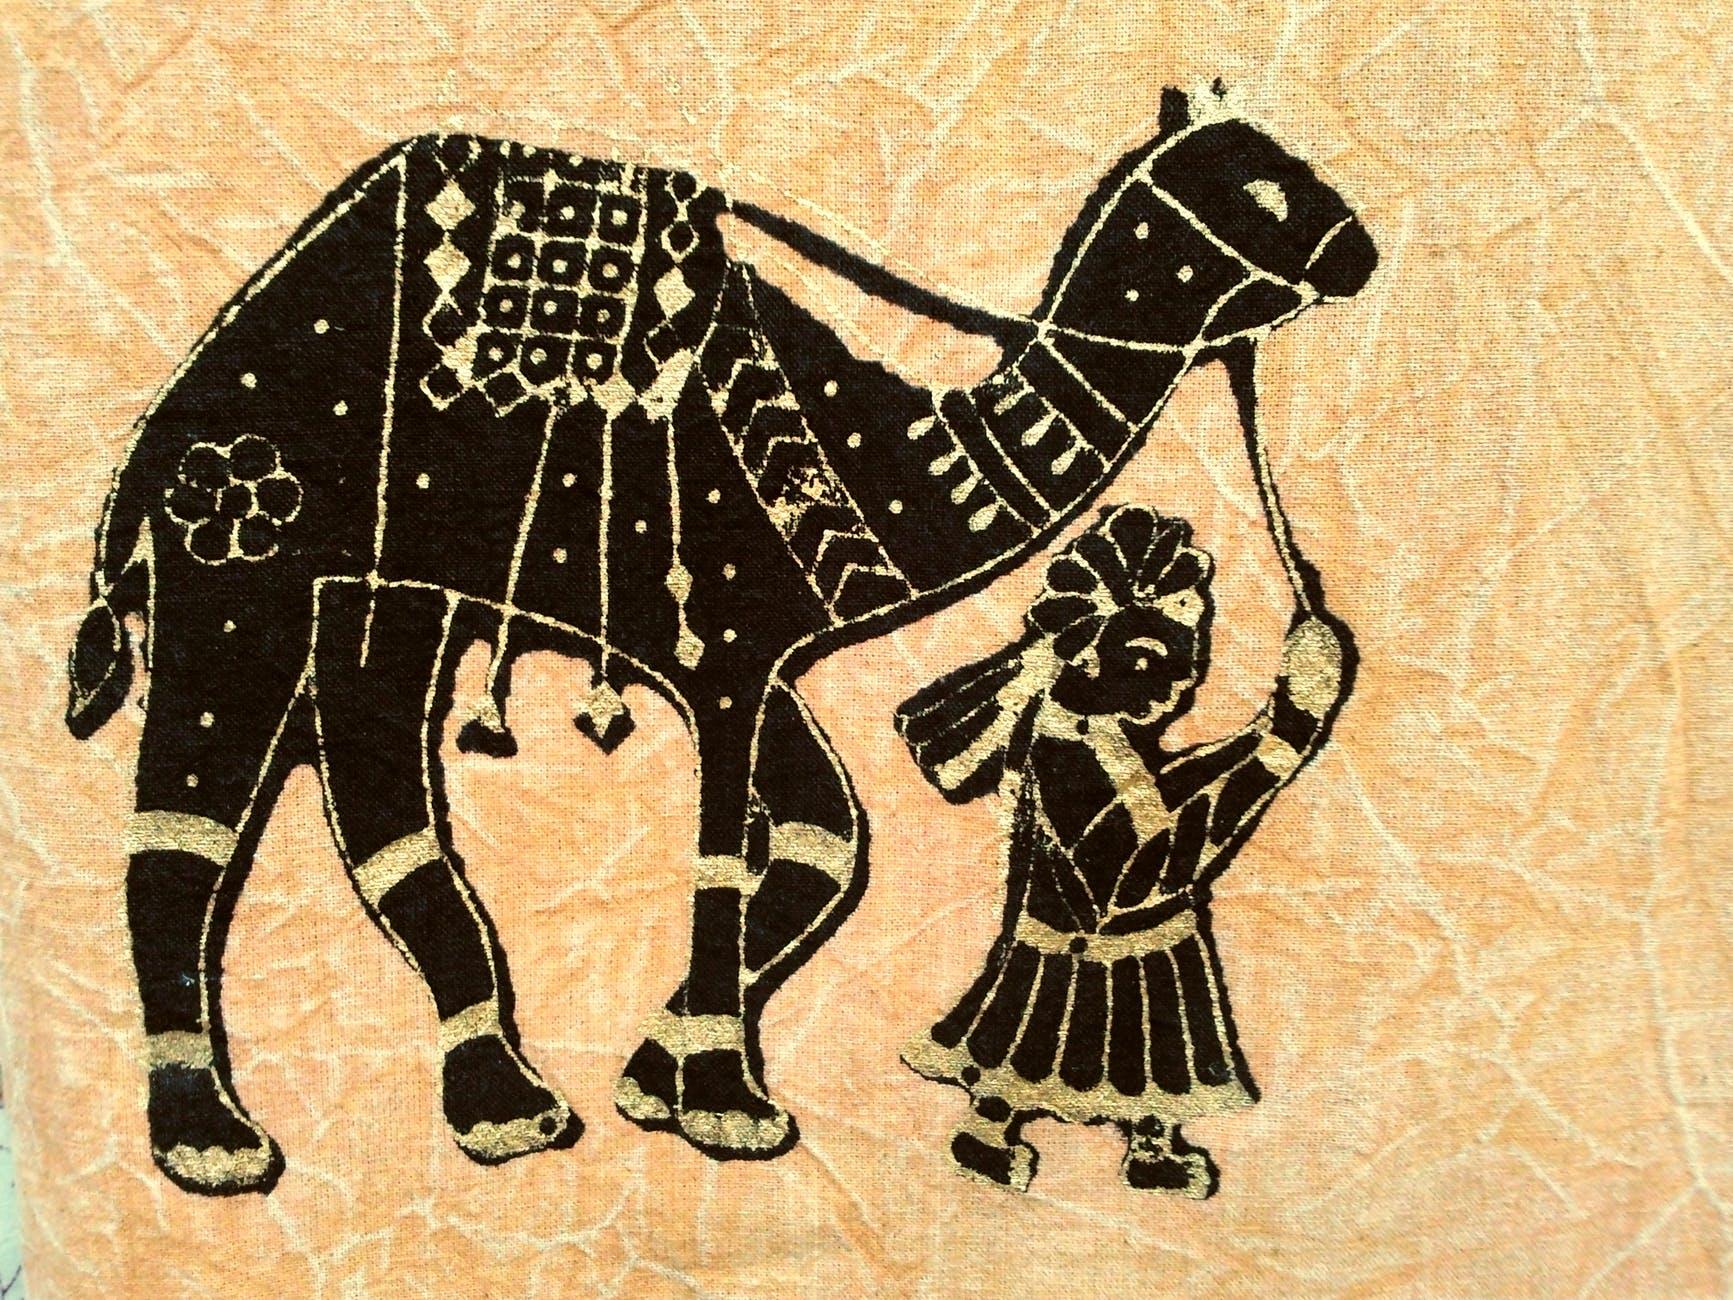 antique apparel art artwork